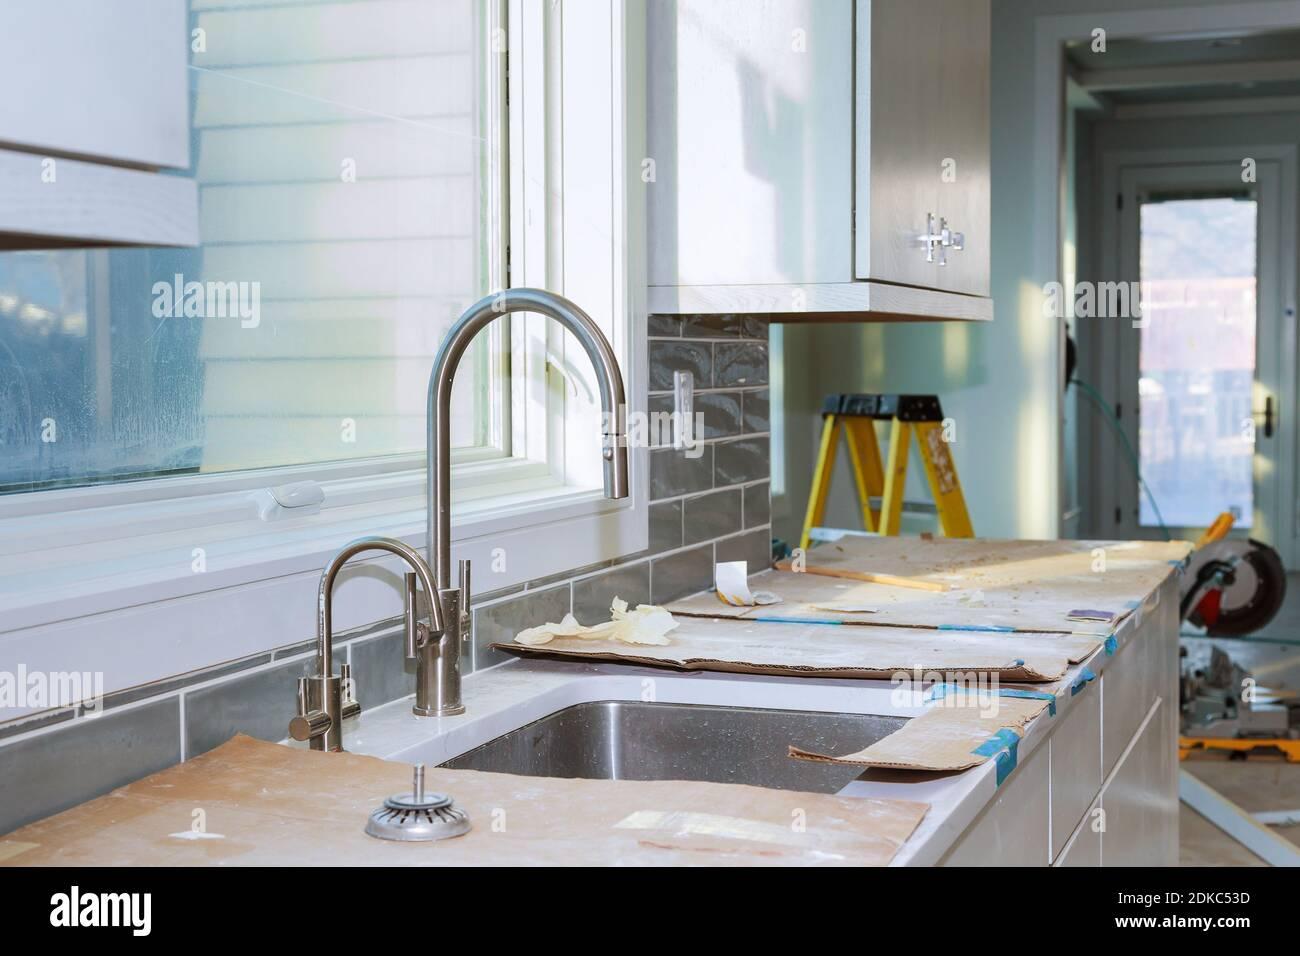 Kitchen Cabinets Installation Improvement Kitchen Remodel Worm S View Installed In A New Kitchen Stock Photo Alamy